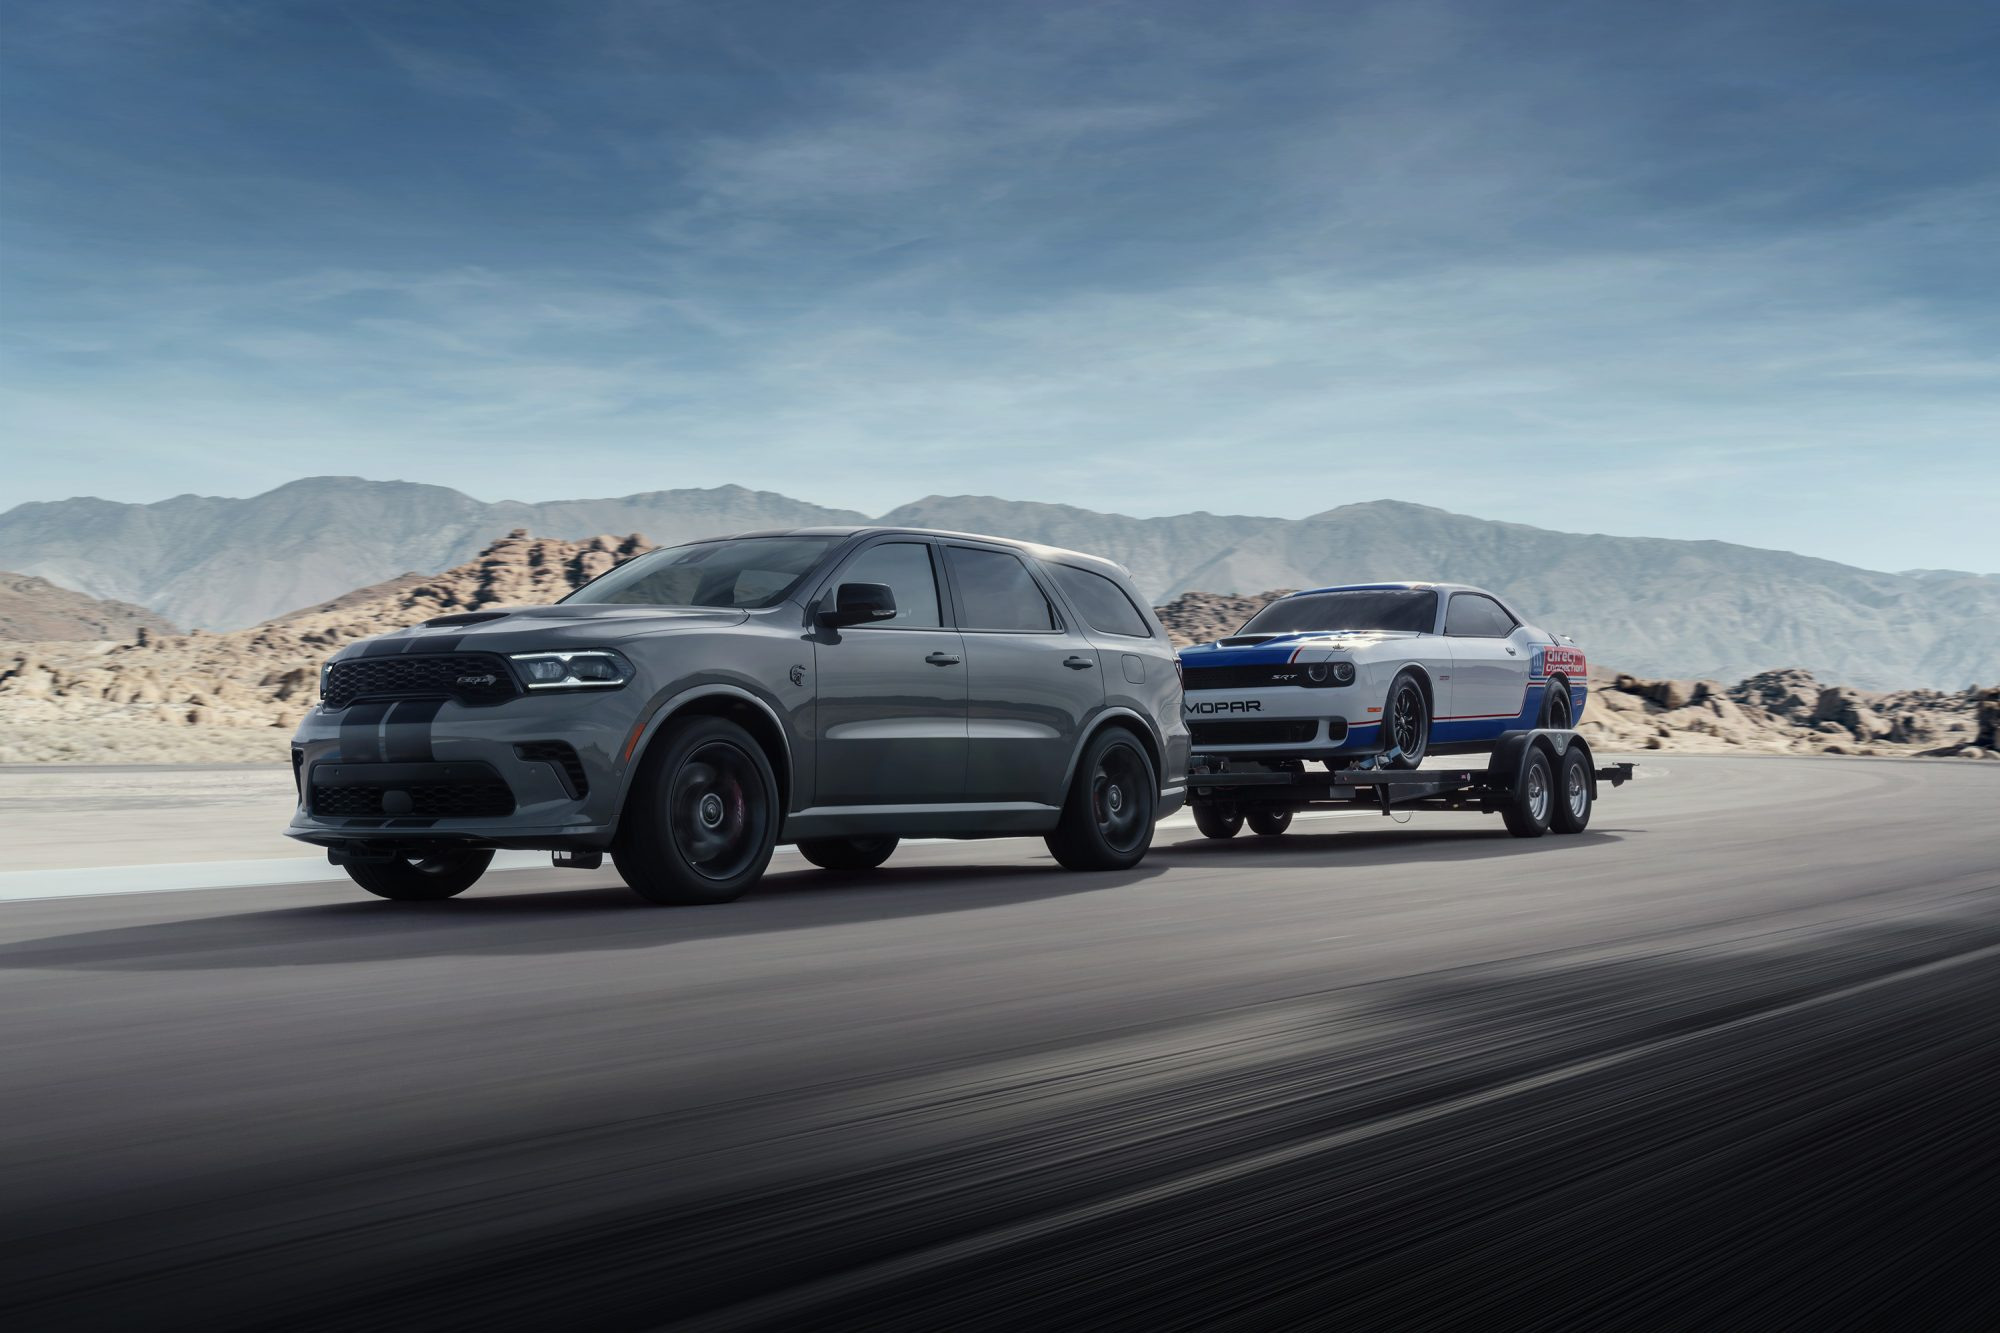 Durango SRT Hellcat towing a Dodge Challenger Mopar Drag Pak